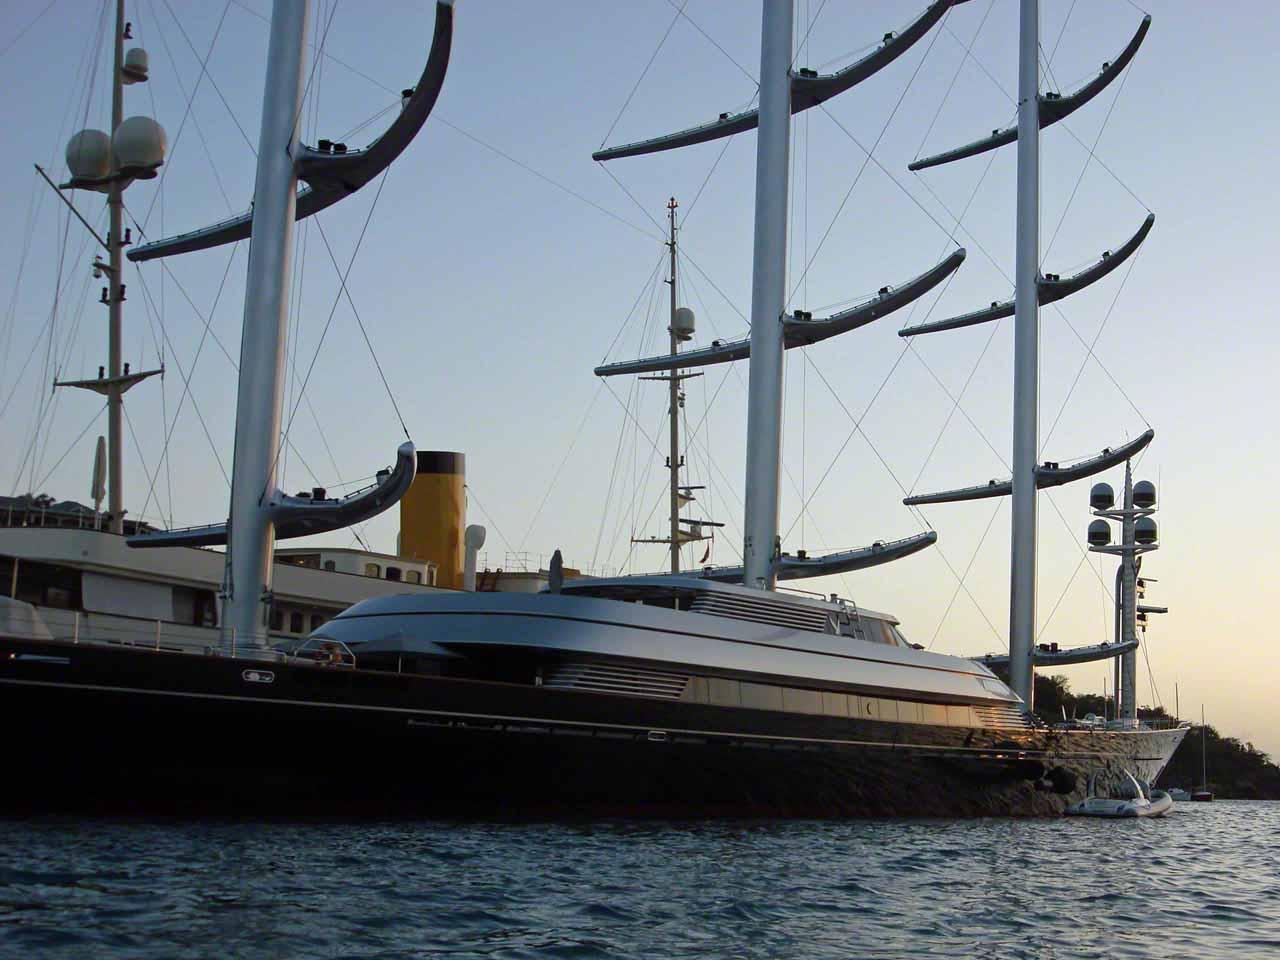 Maltese Falcon at the dock